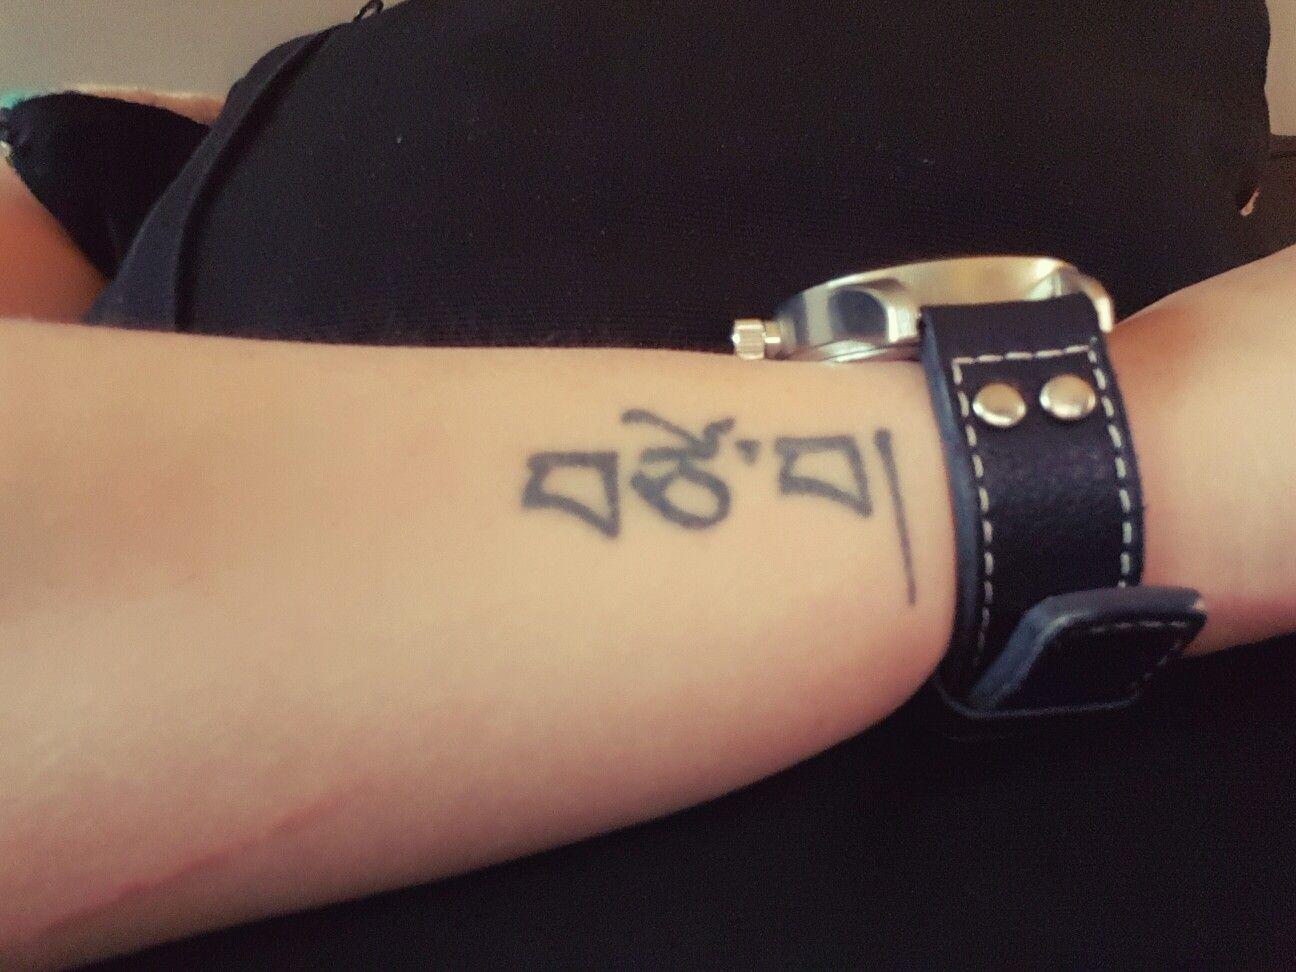 tattoo liefde love tibetaans schrift arm pols vrouw women tatoeages die ik leuk vind. Black Bedroom Furniture Sets. Home Design Ideas